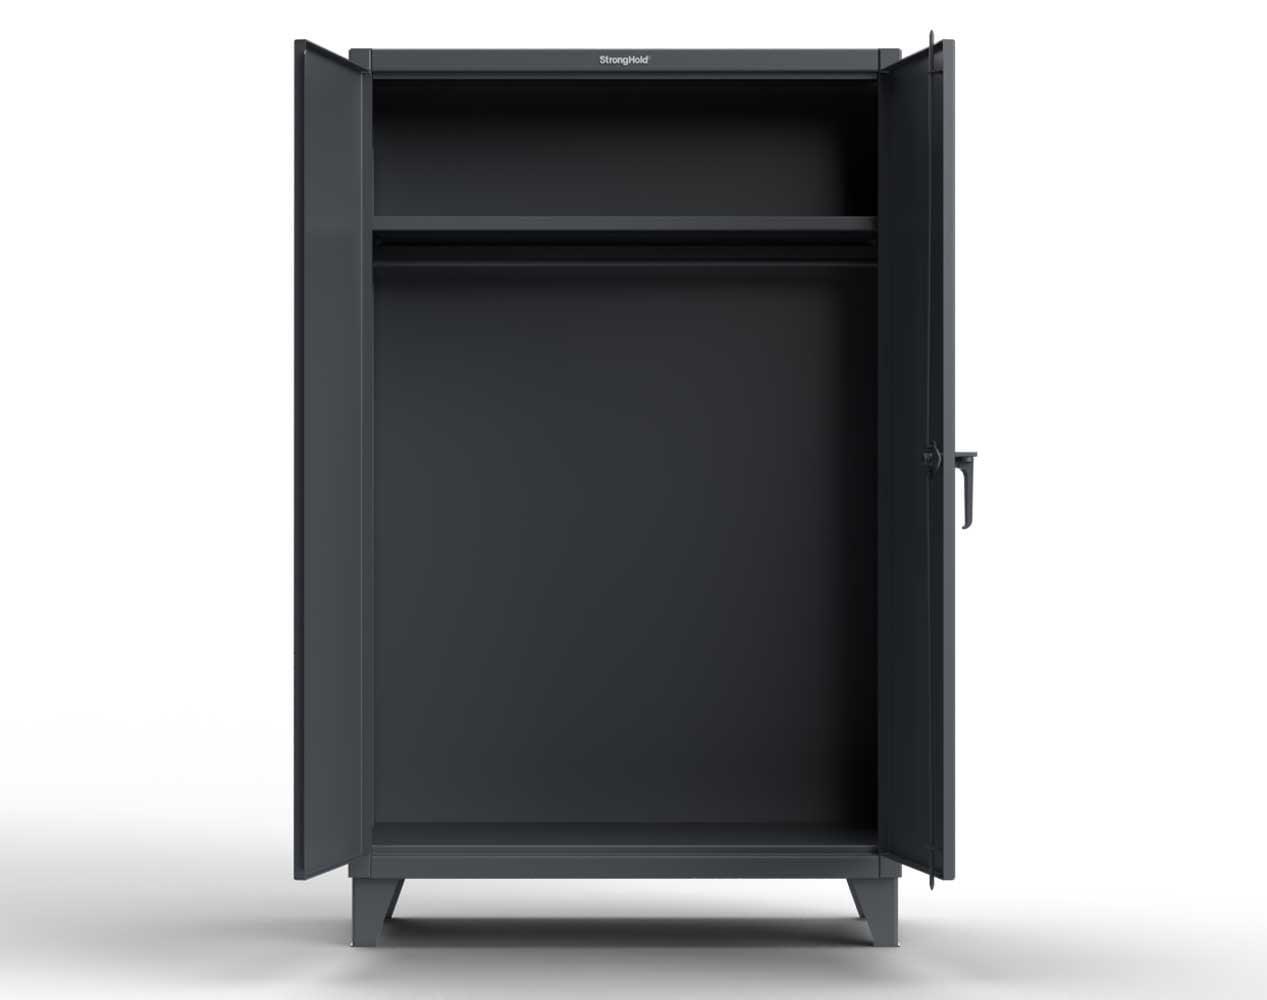 Extreme Duty 12 GA Uniform Cabinet with Hanger Rod, 1 Shelf – 60 In. W x 24 In. D x 78 In. H